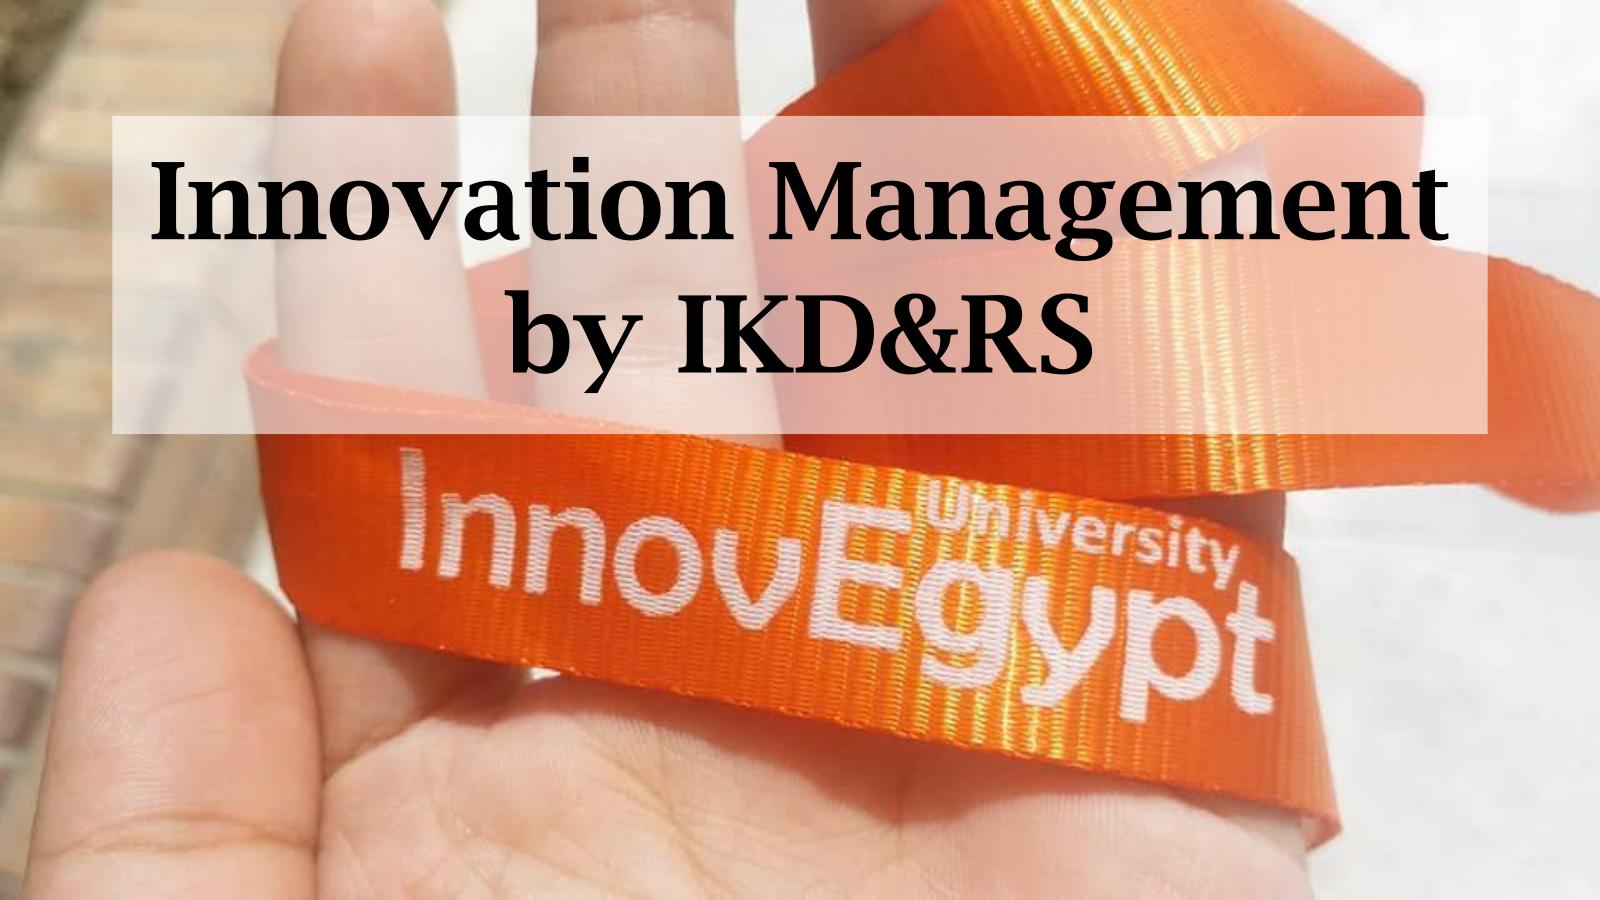 Training Kit for Innovation & Technology Management – InnovEgypt Program by IKD&RS